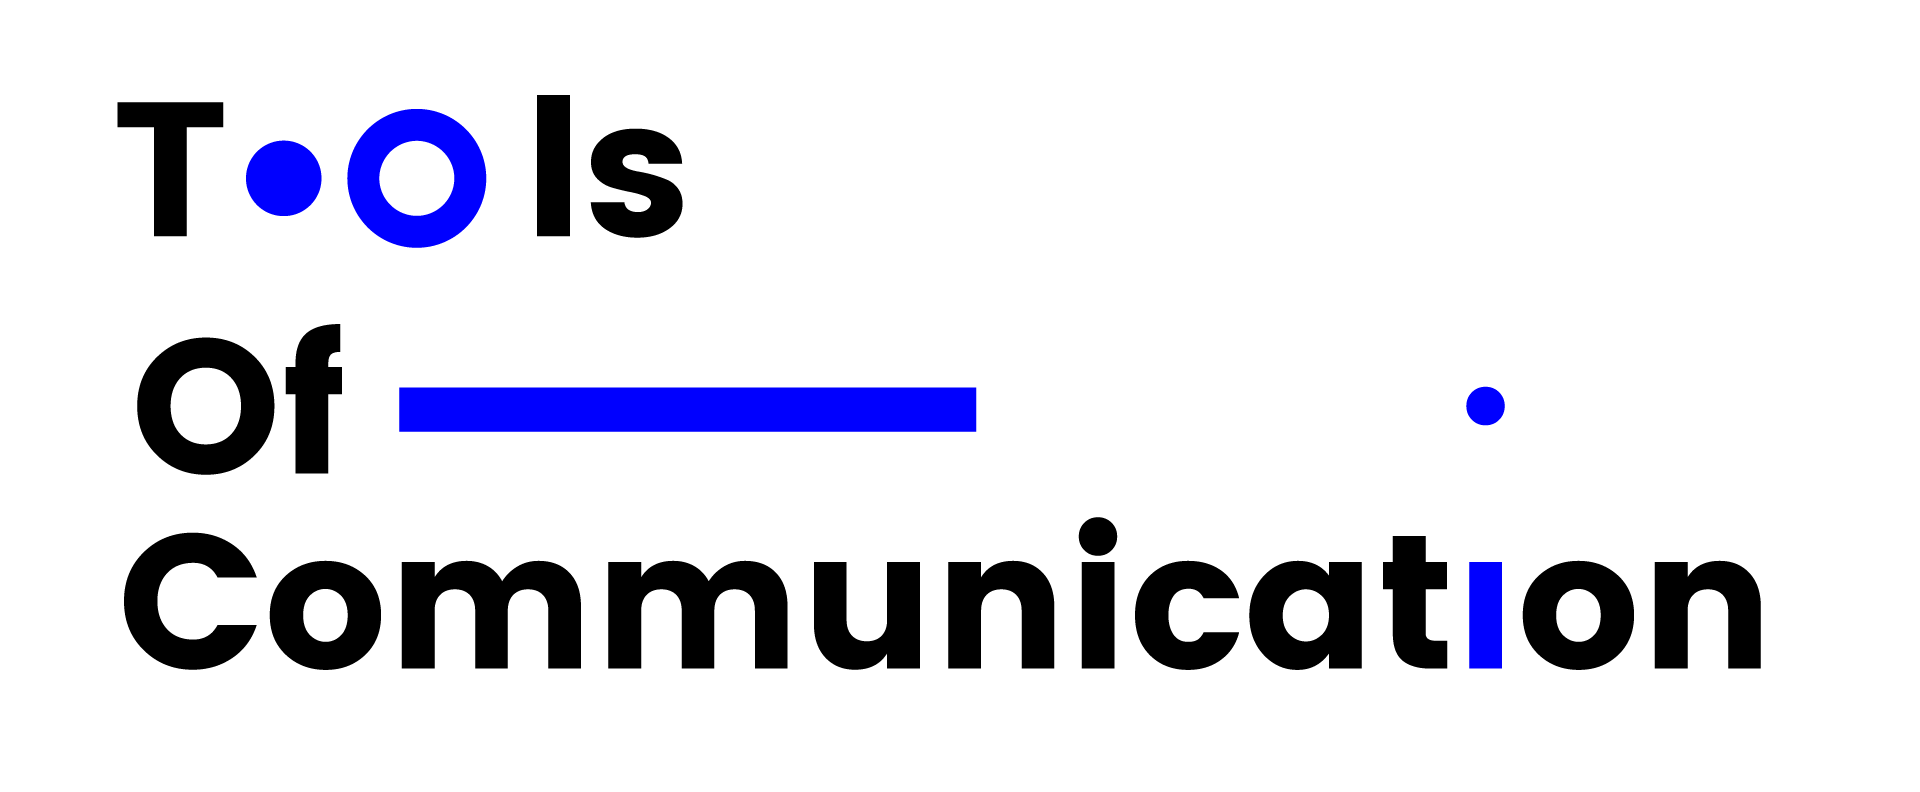 Tools of Communication